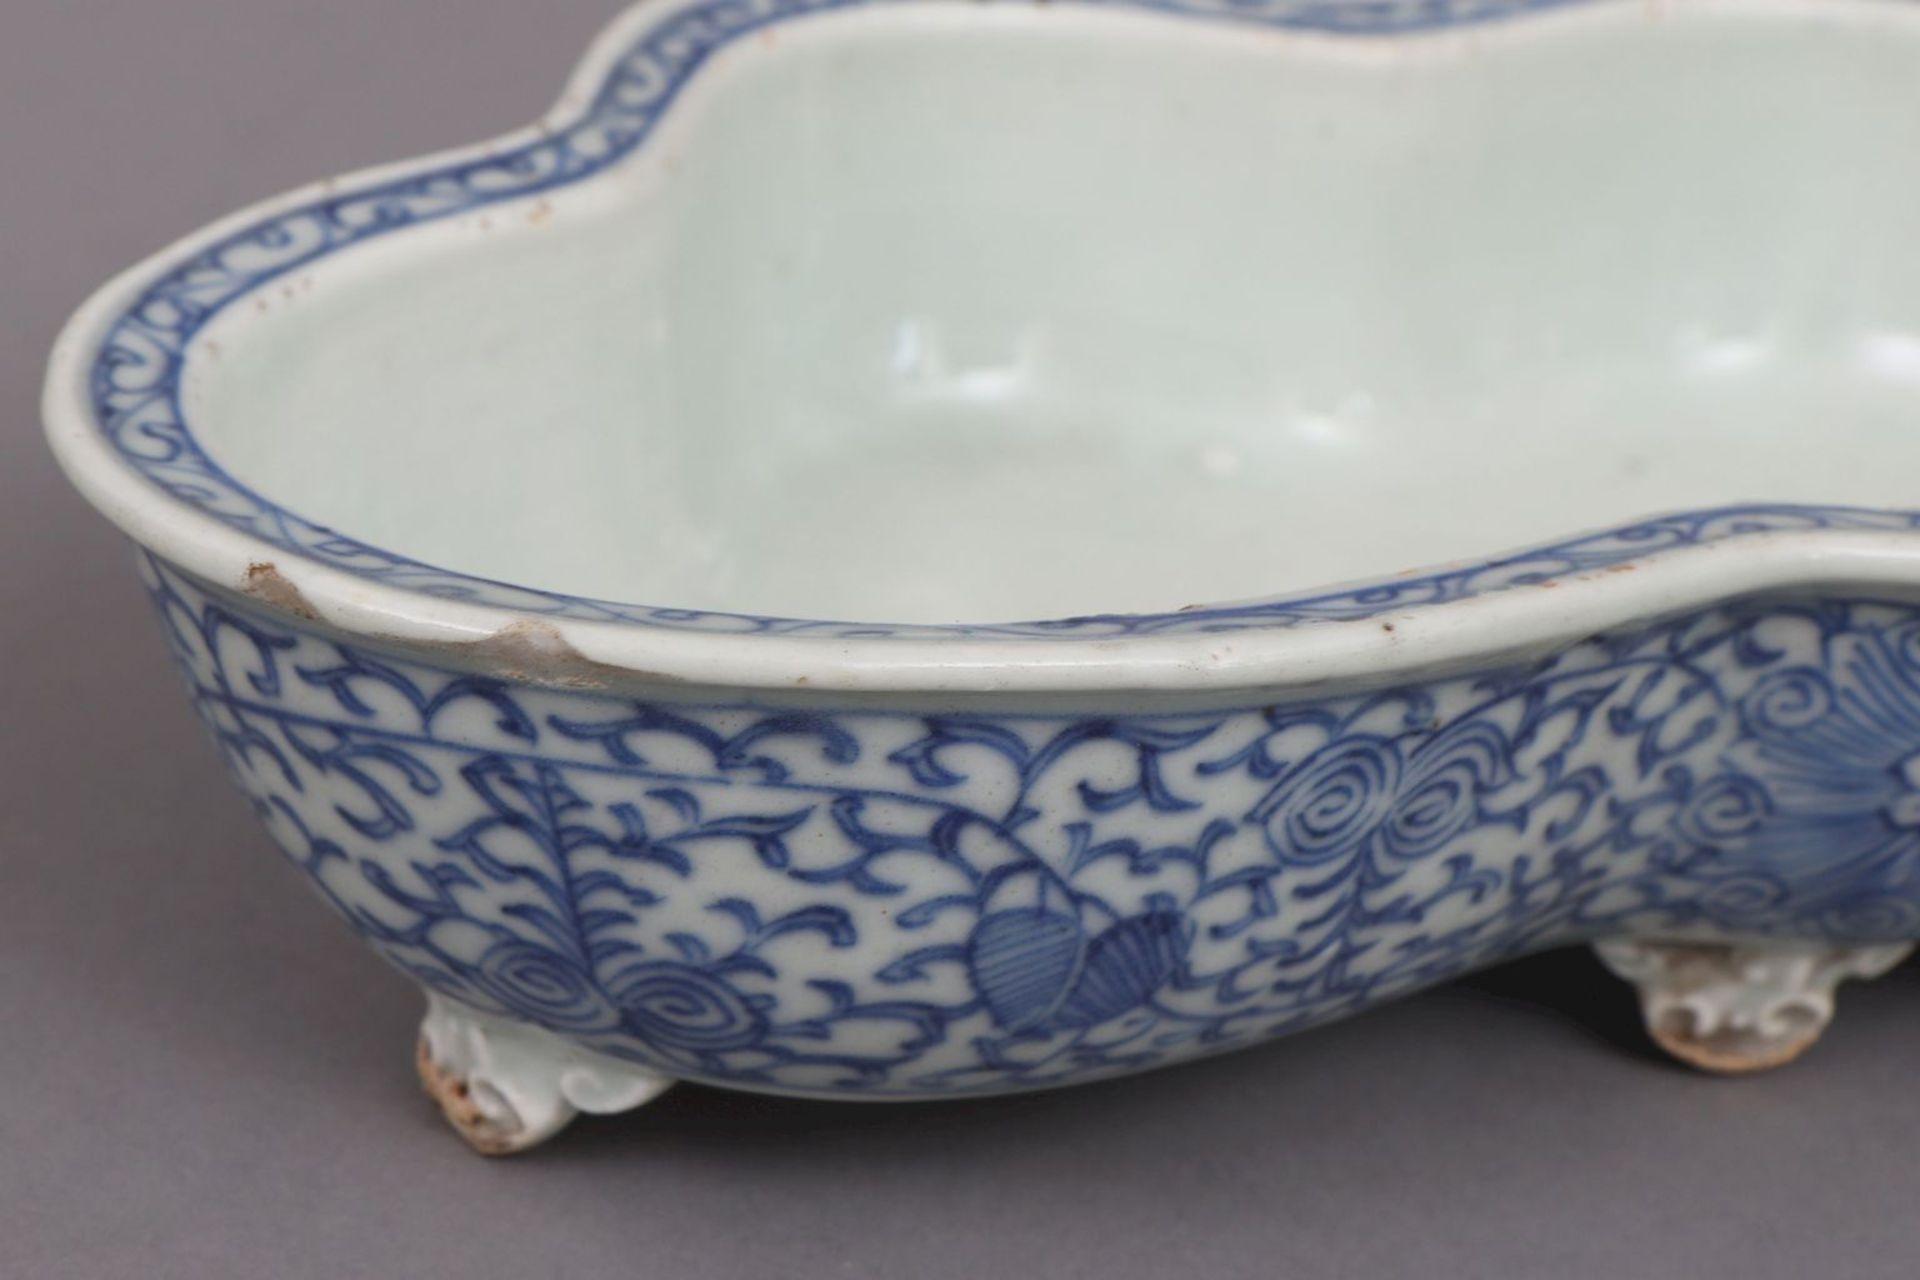 Chinesische Bonsai-Pflanzschale - Image 4 of 5